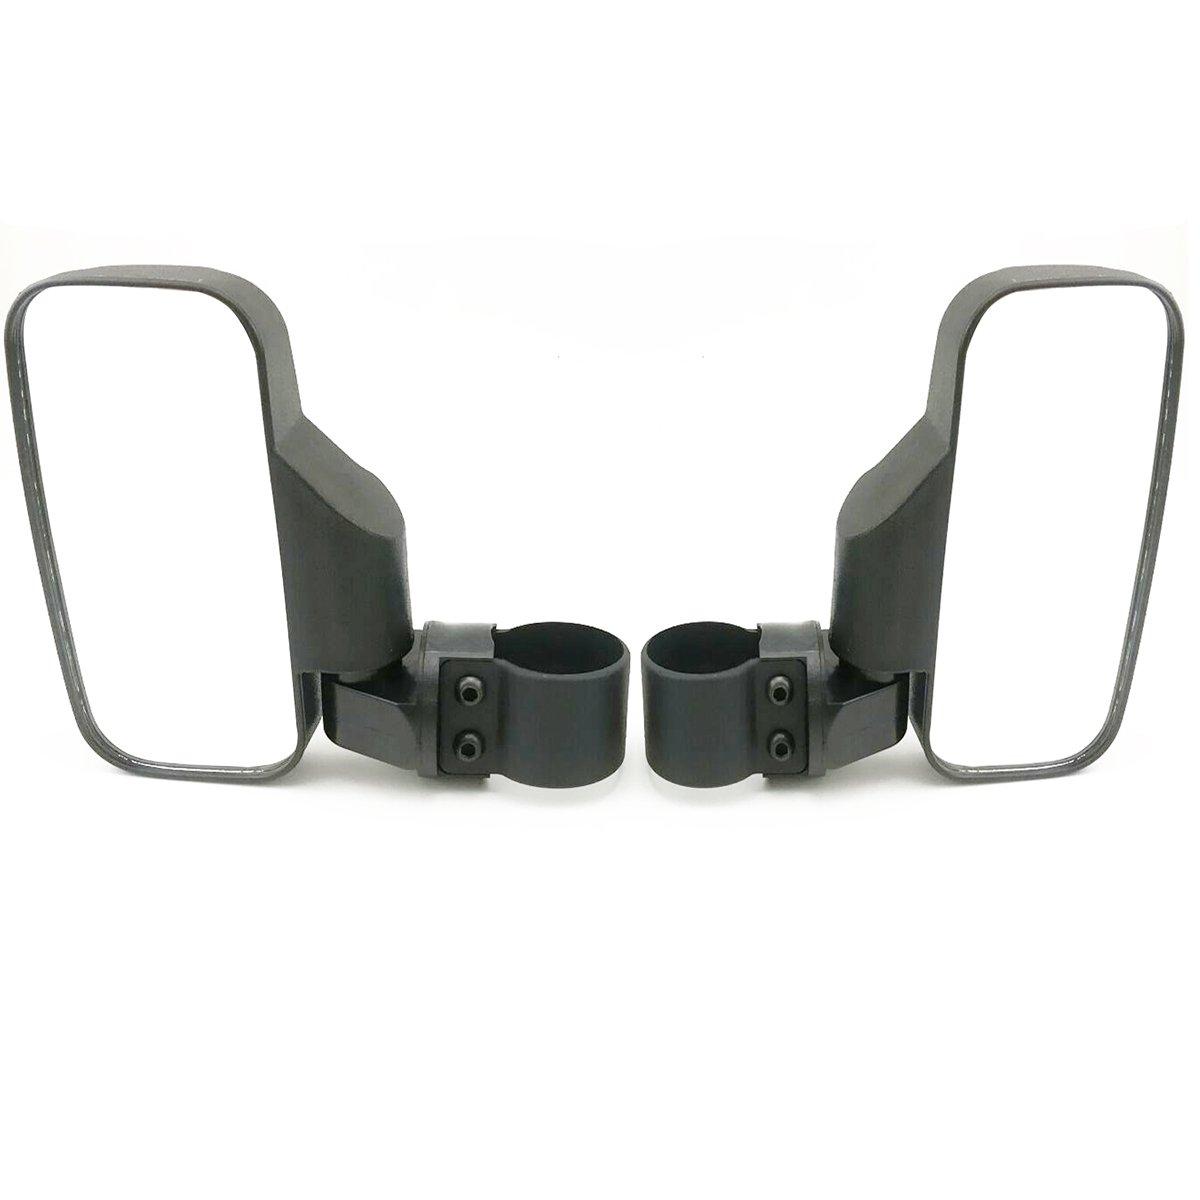 OKSTNO UTV Side View Mirror for 1.5'' - 2'' Roll Cage Tempered Glass Breakaway Mirrors for Polaris Ranger RZR, Can Am Commander, Maverick, Gator, Rhino